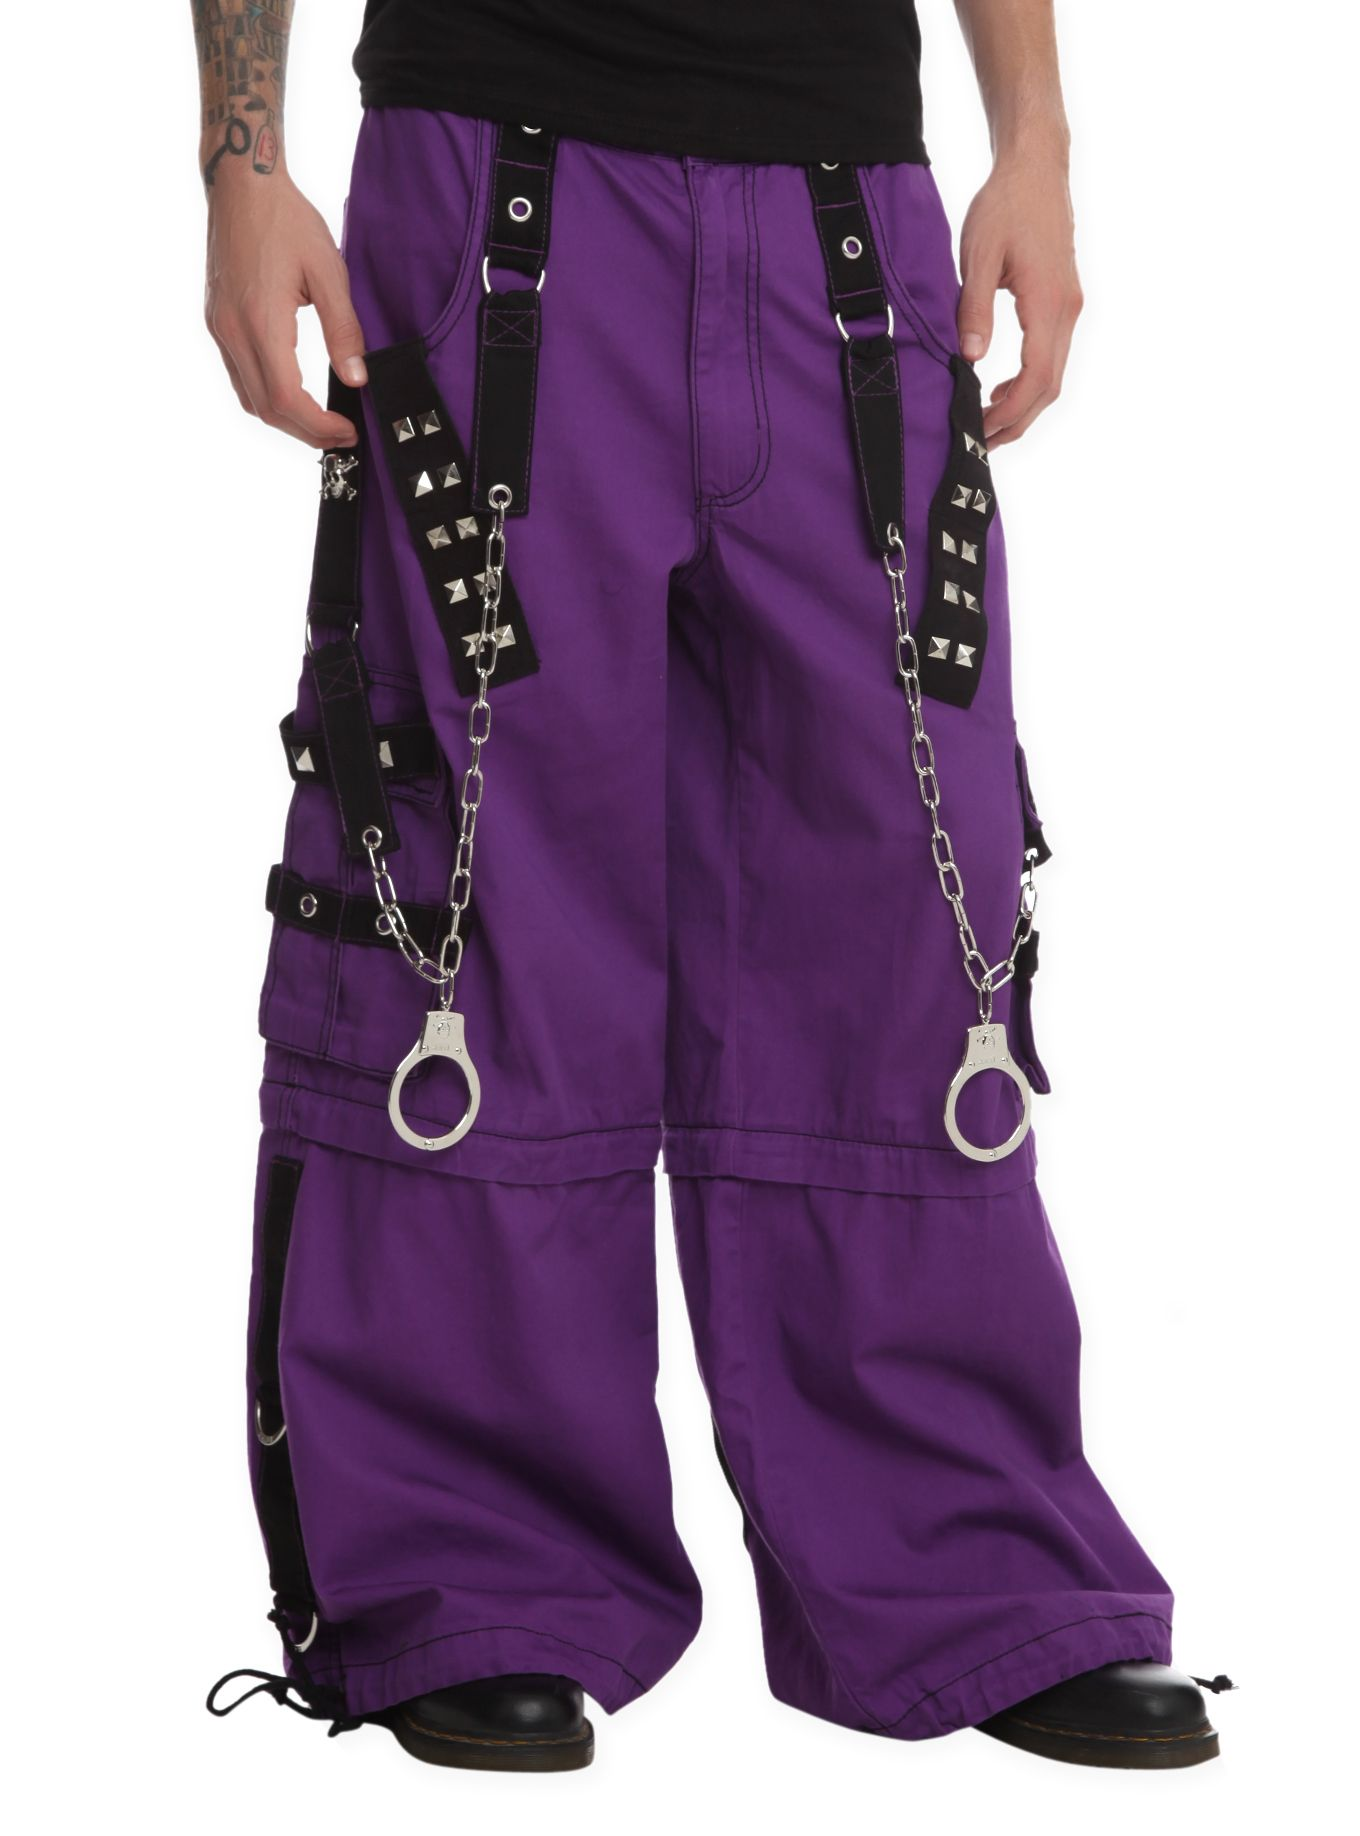 ad1594346e799 Tripp Purple   Black Grommet Stud Chain Pants